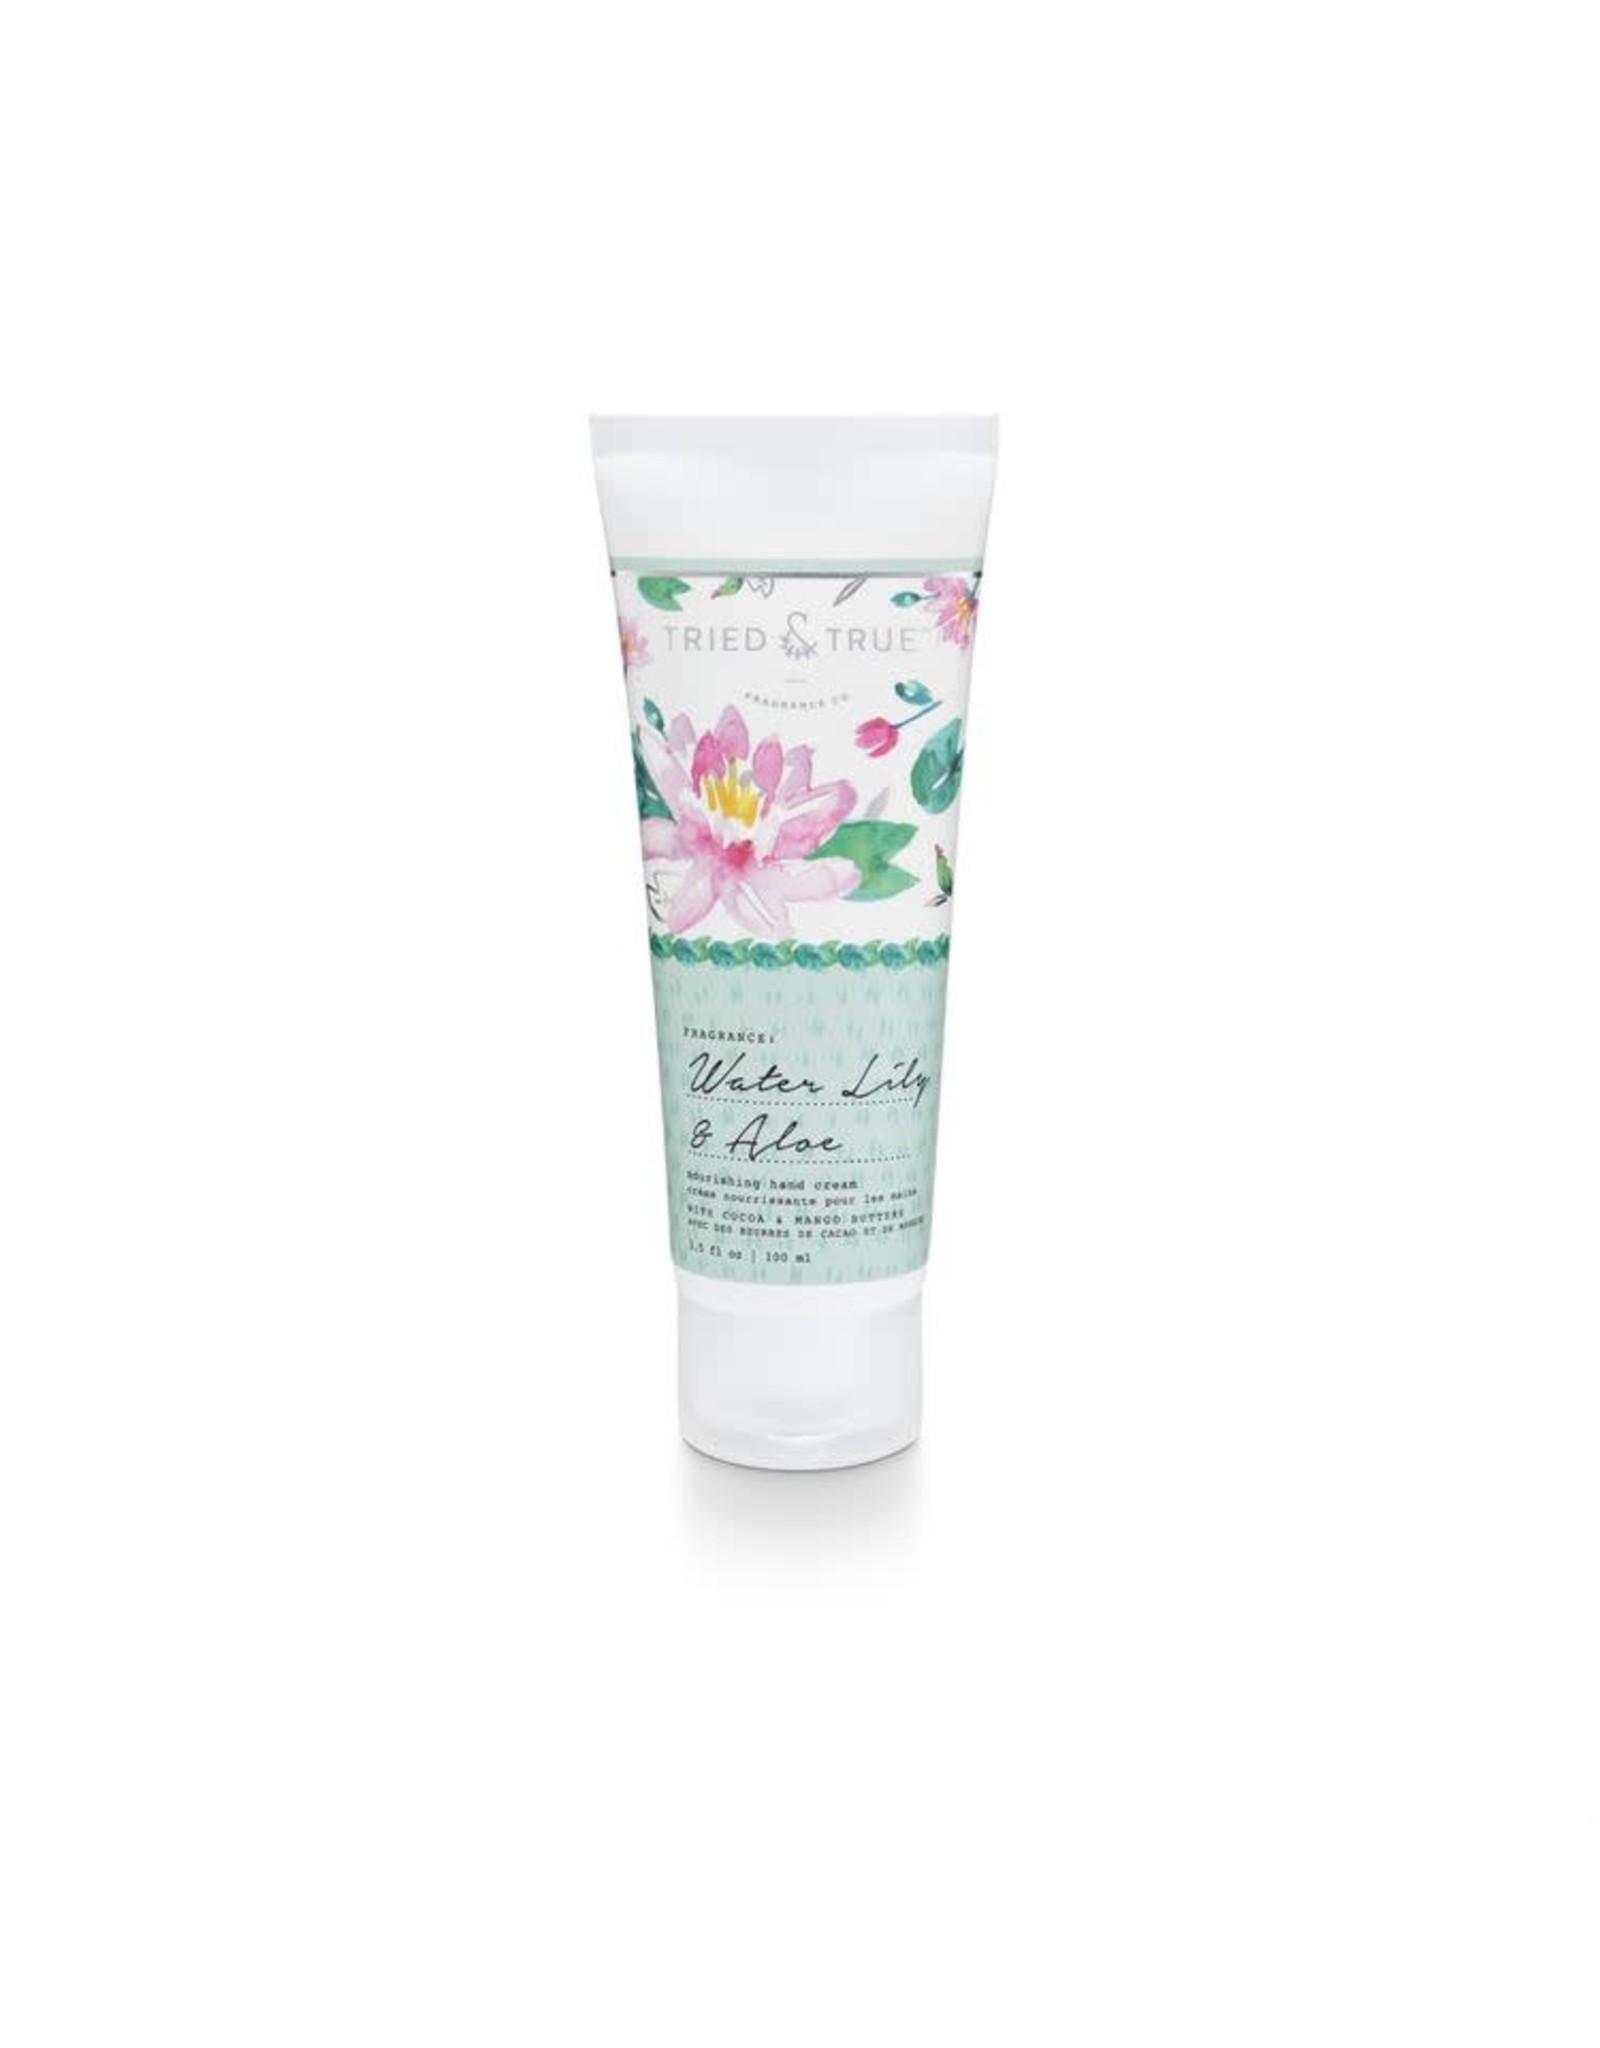 The Florist & The Merchant 3.5 oz Hand Cream - Water Lily & Aloe